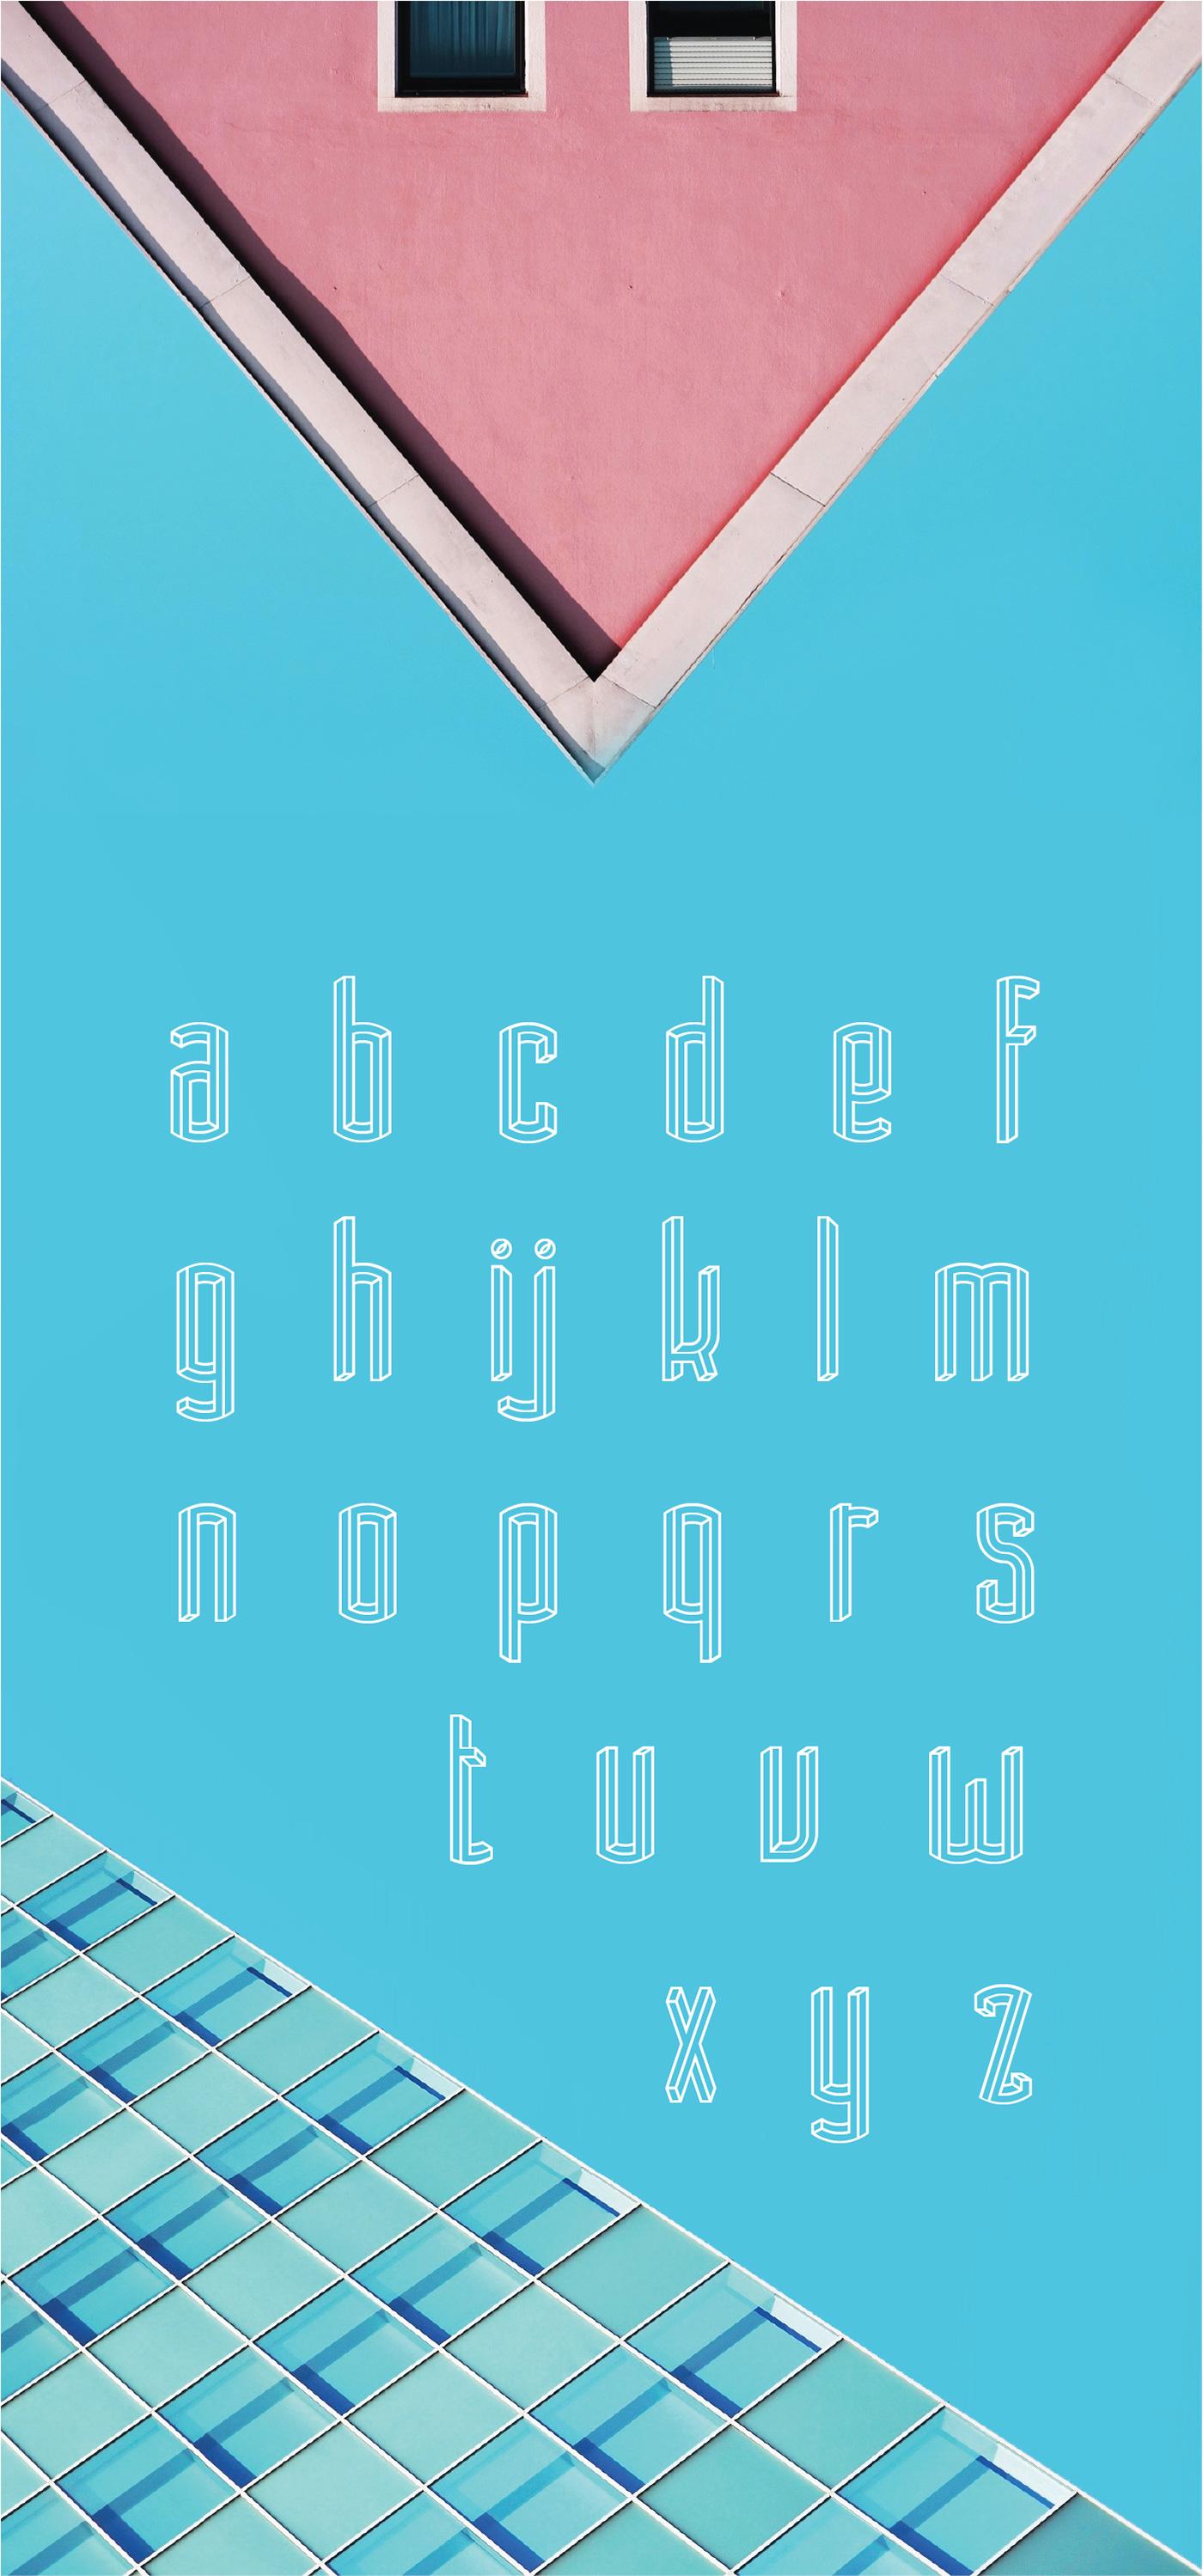 font modern illusion escher tall condensed poster logo crazy Beautiful